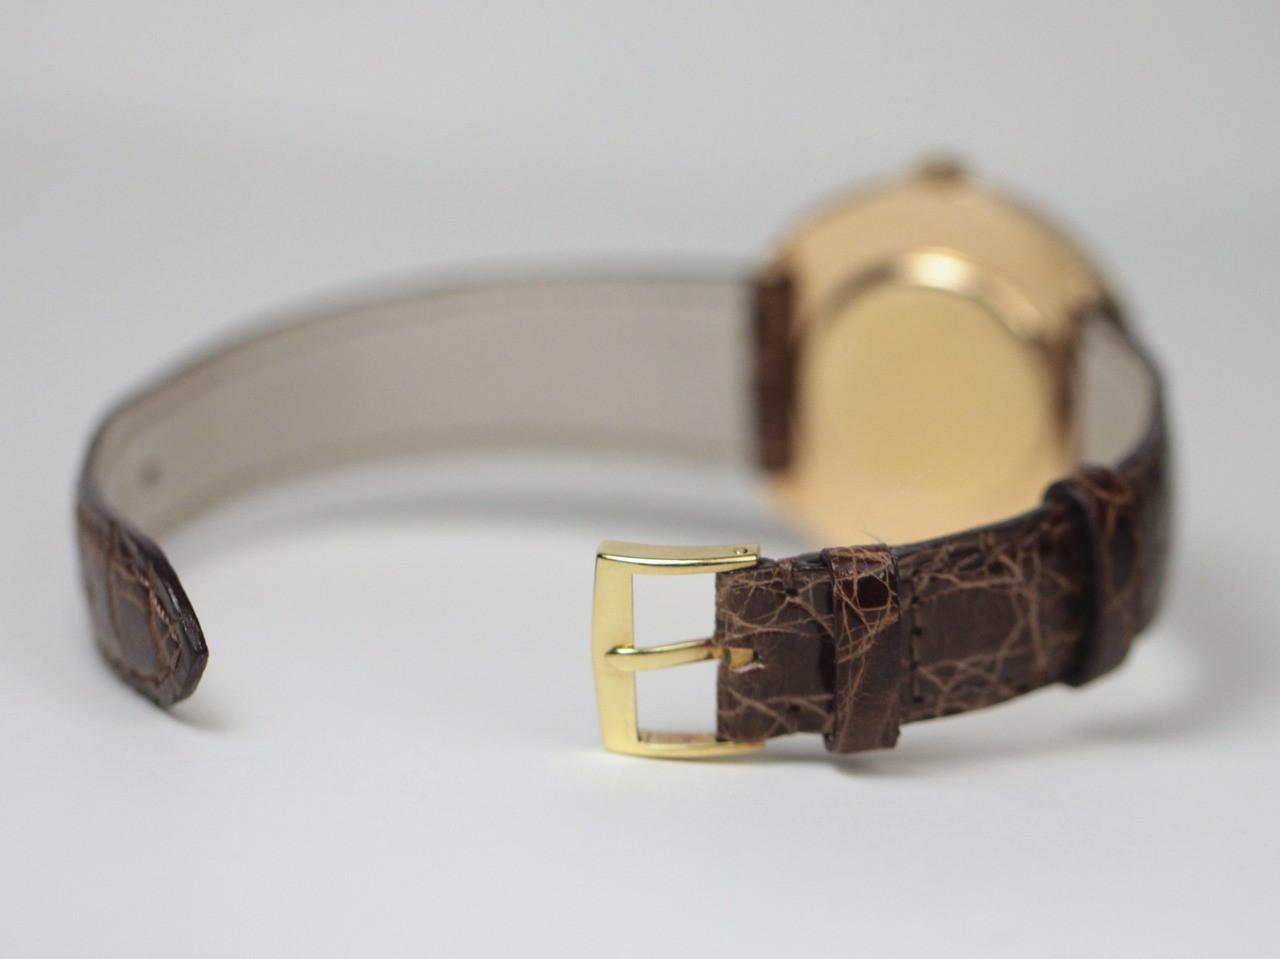 Tang Buckle - Vintage Vacheron Constantin Vintage Gold Watch - www.Legendoftime.com - Chicago Watch Center